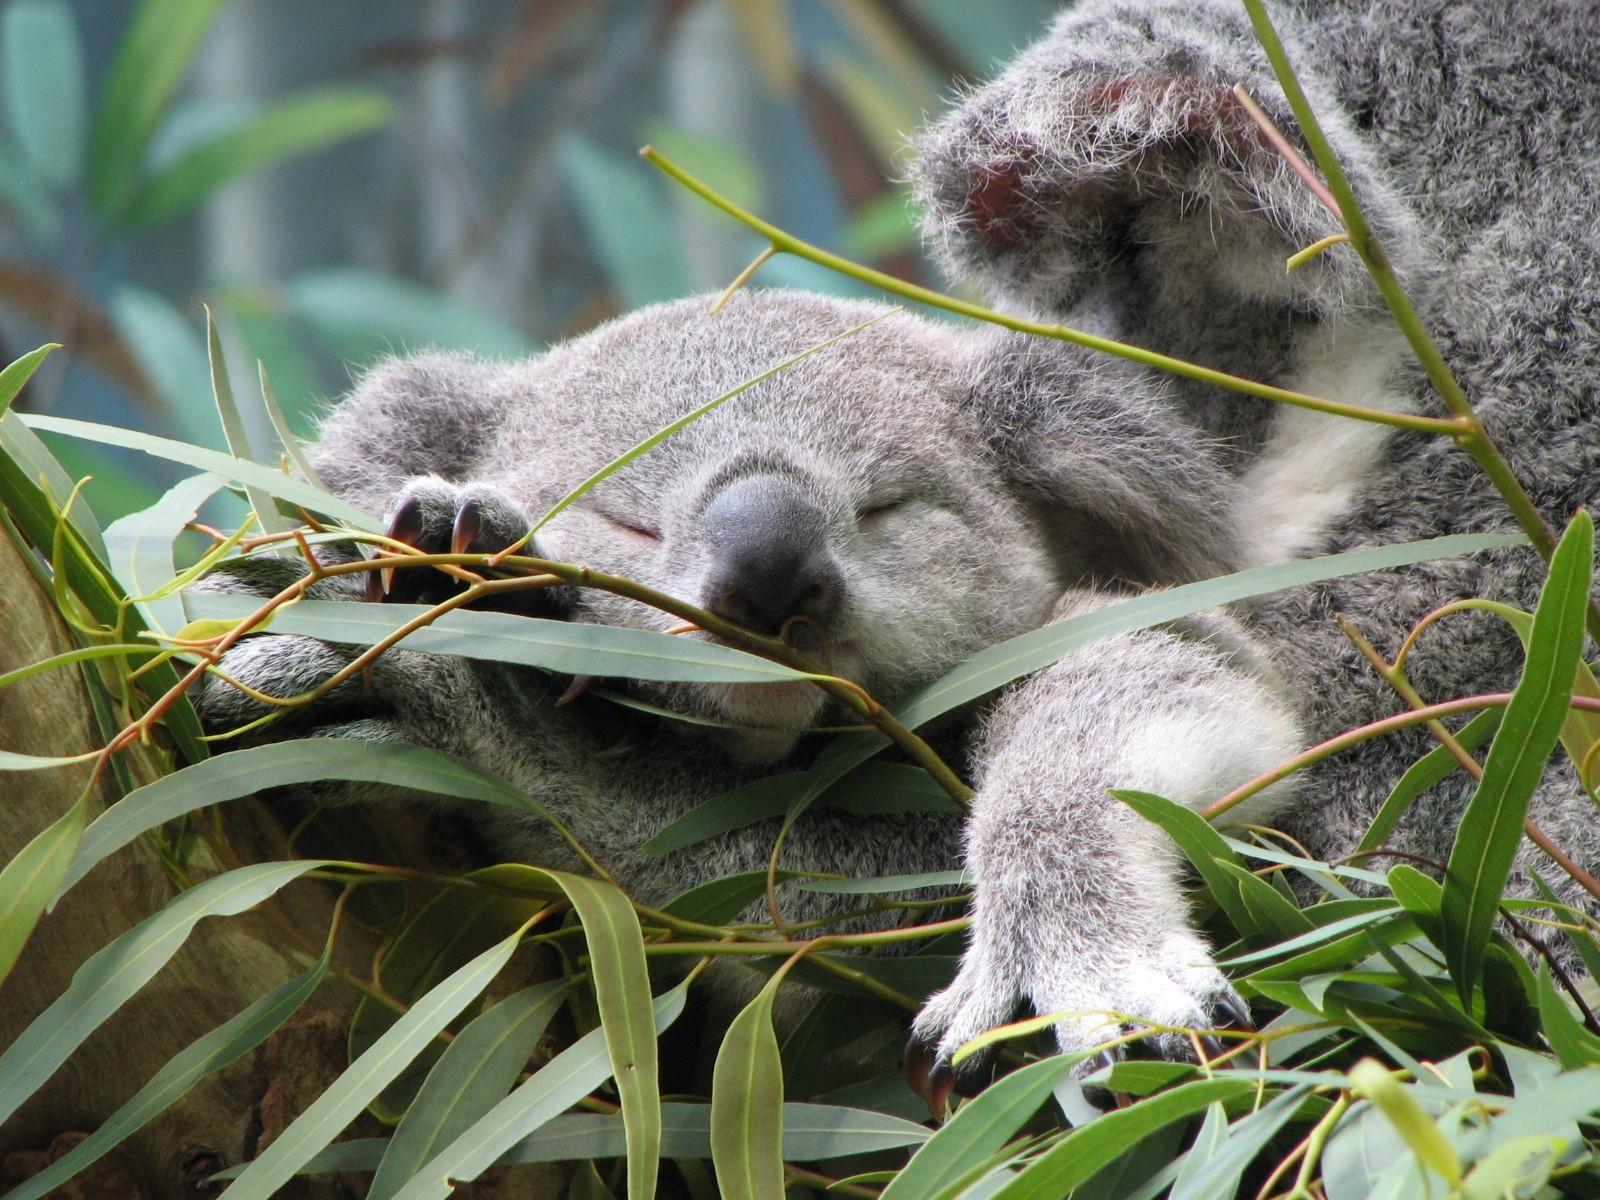 Wallpapers for Koala › Resolution 1920x1080